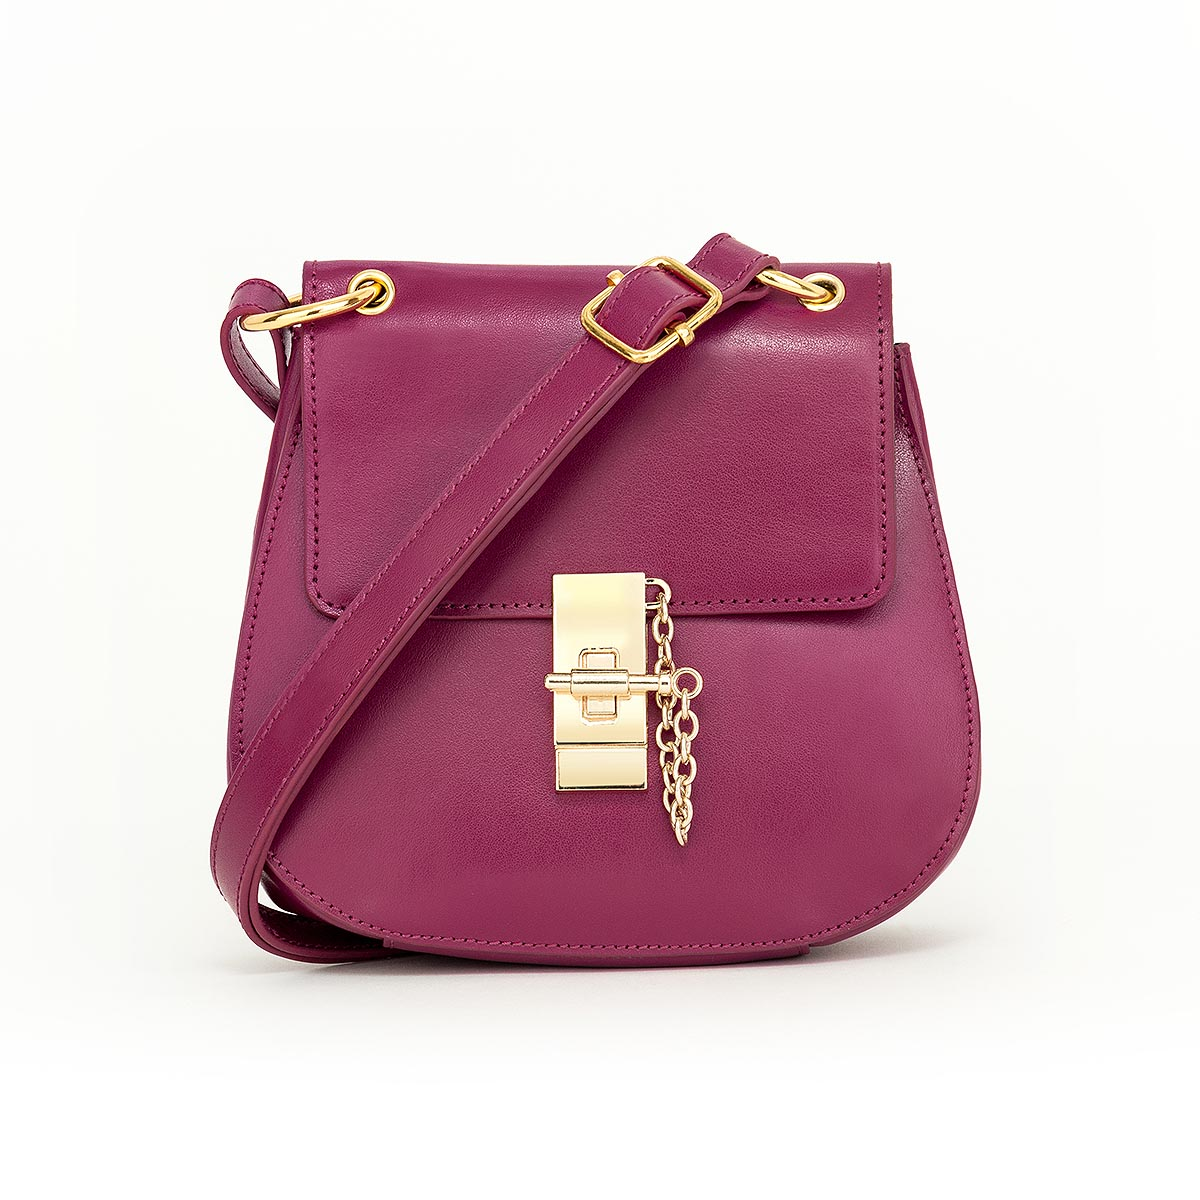 Fashion Handbag Photography